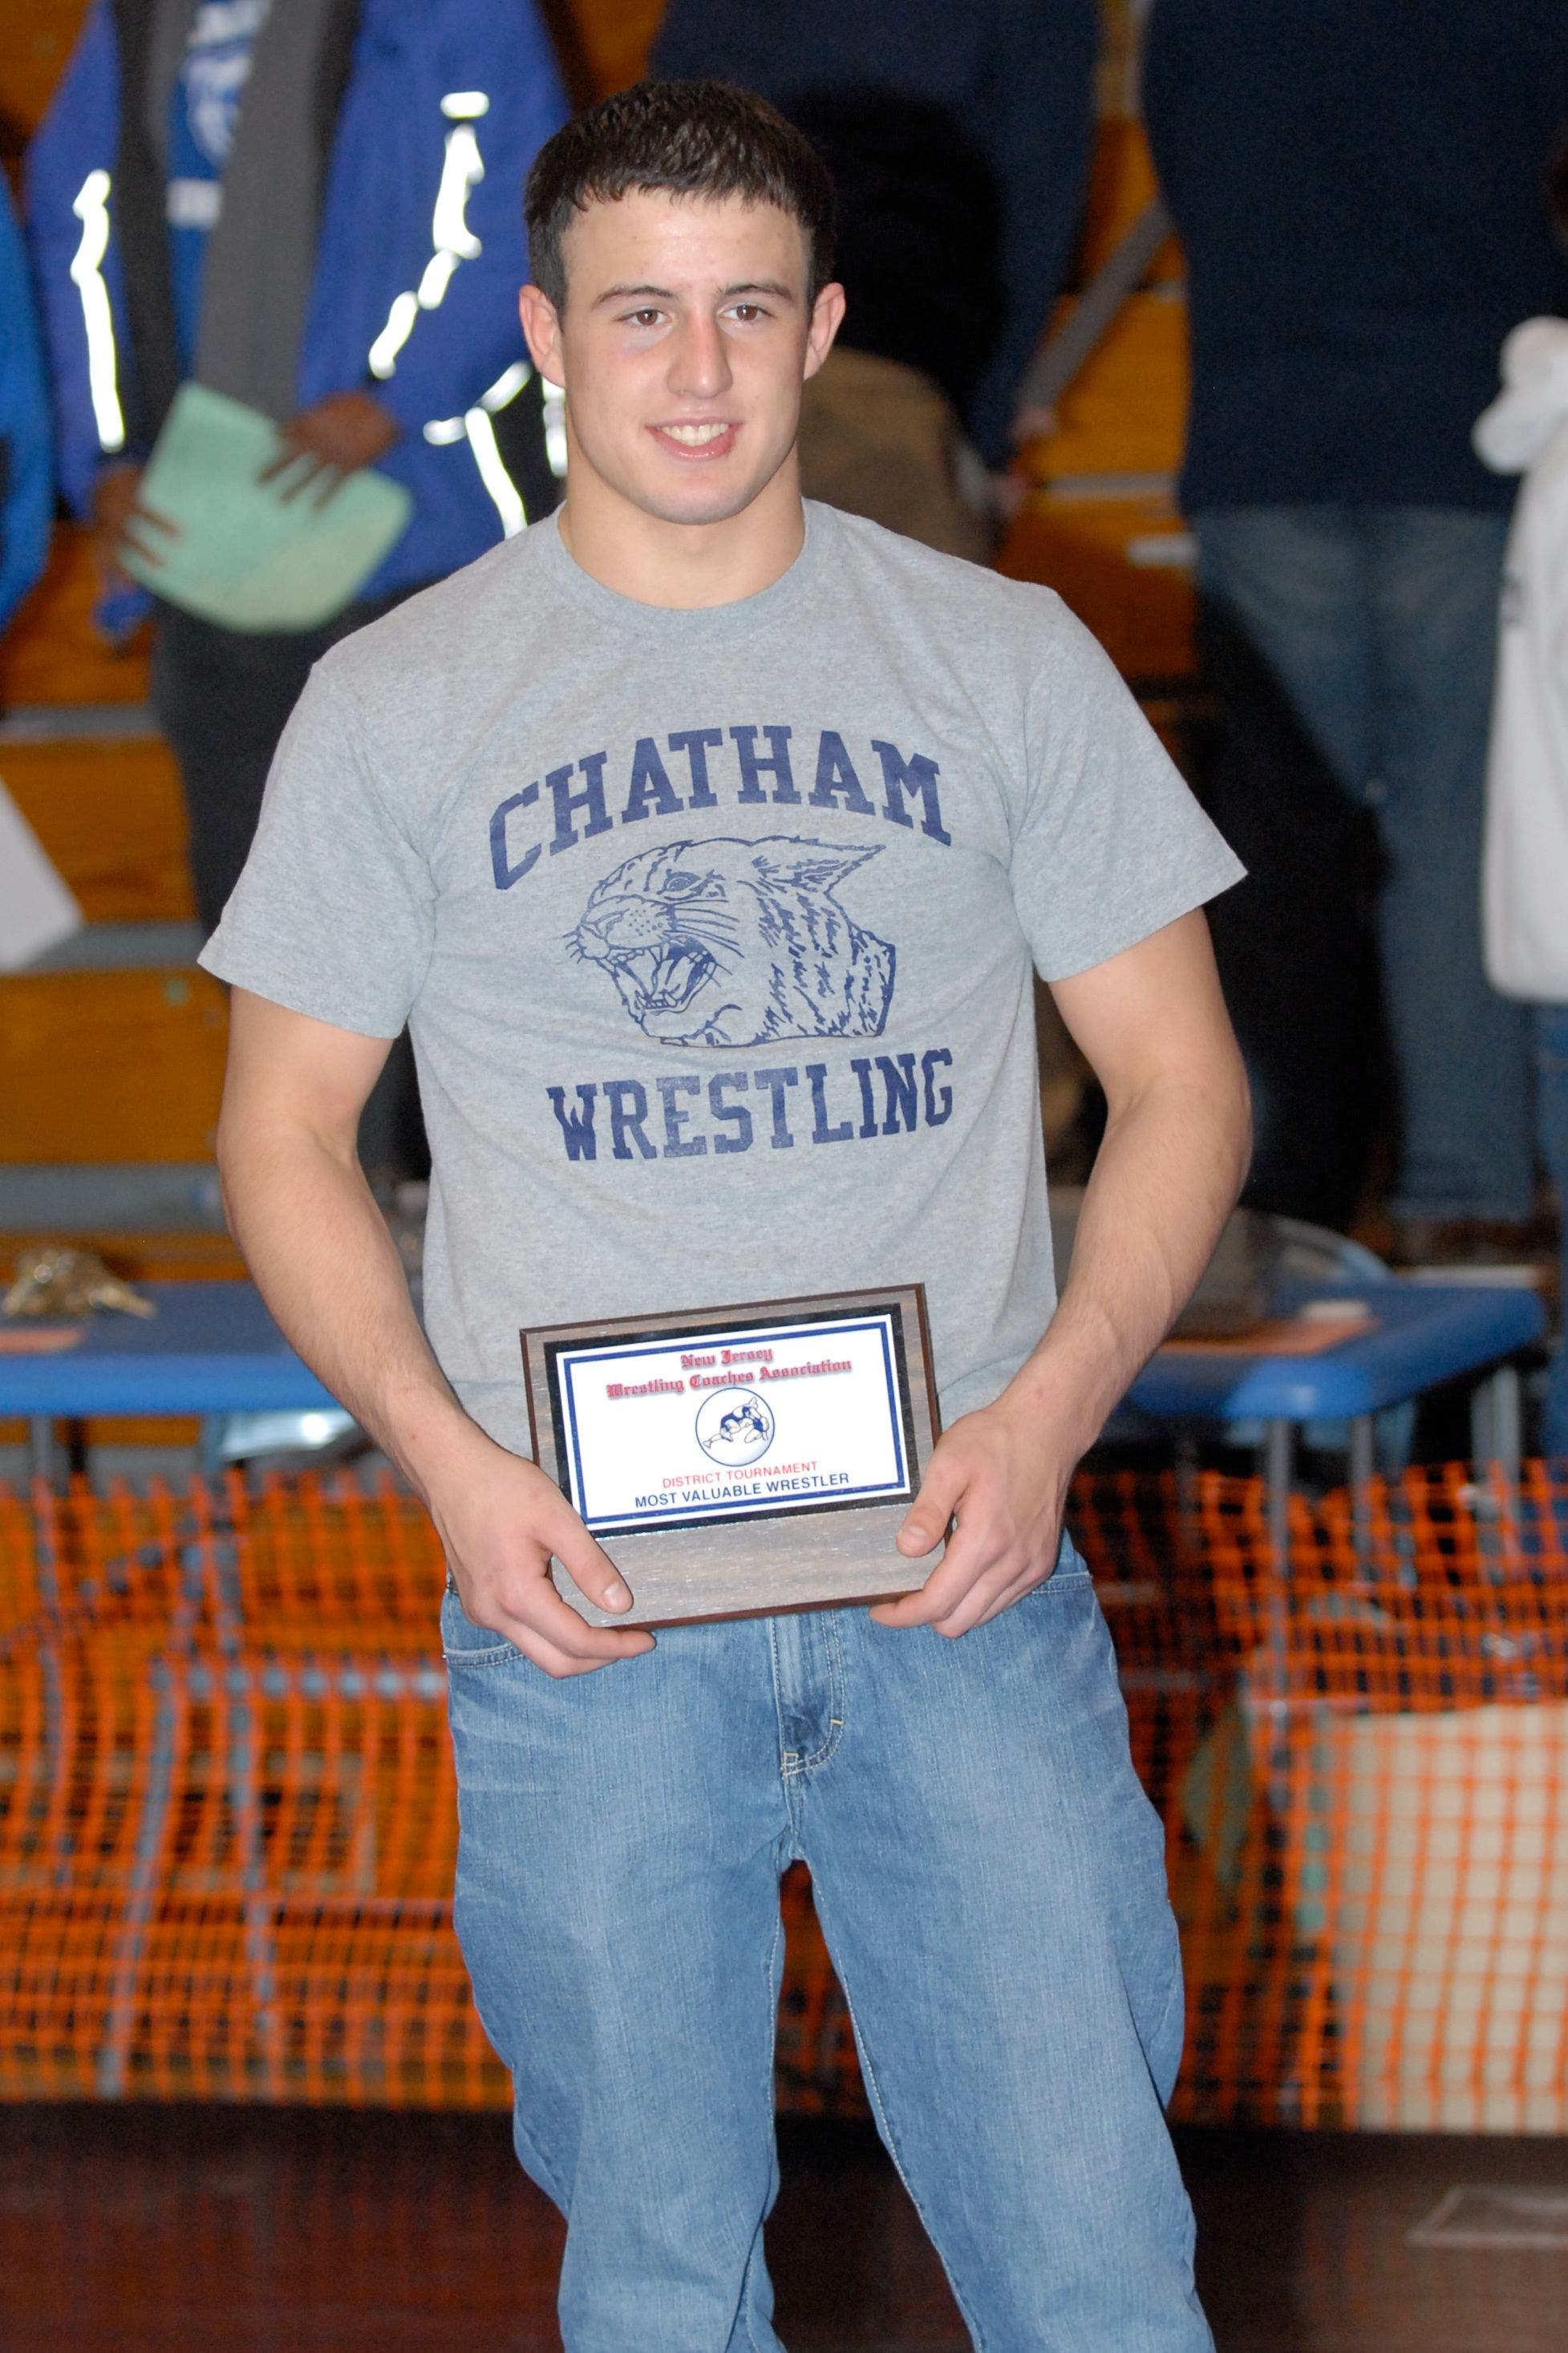 Wrestling Recap: Chatham's Fricke and Furbish Advance to